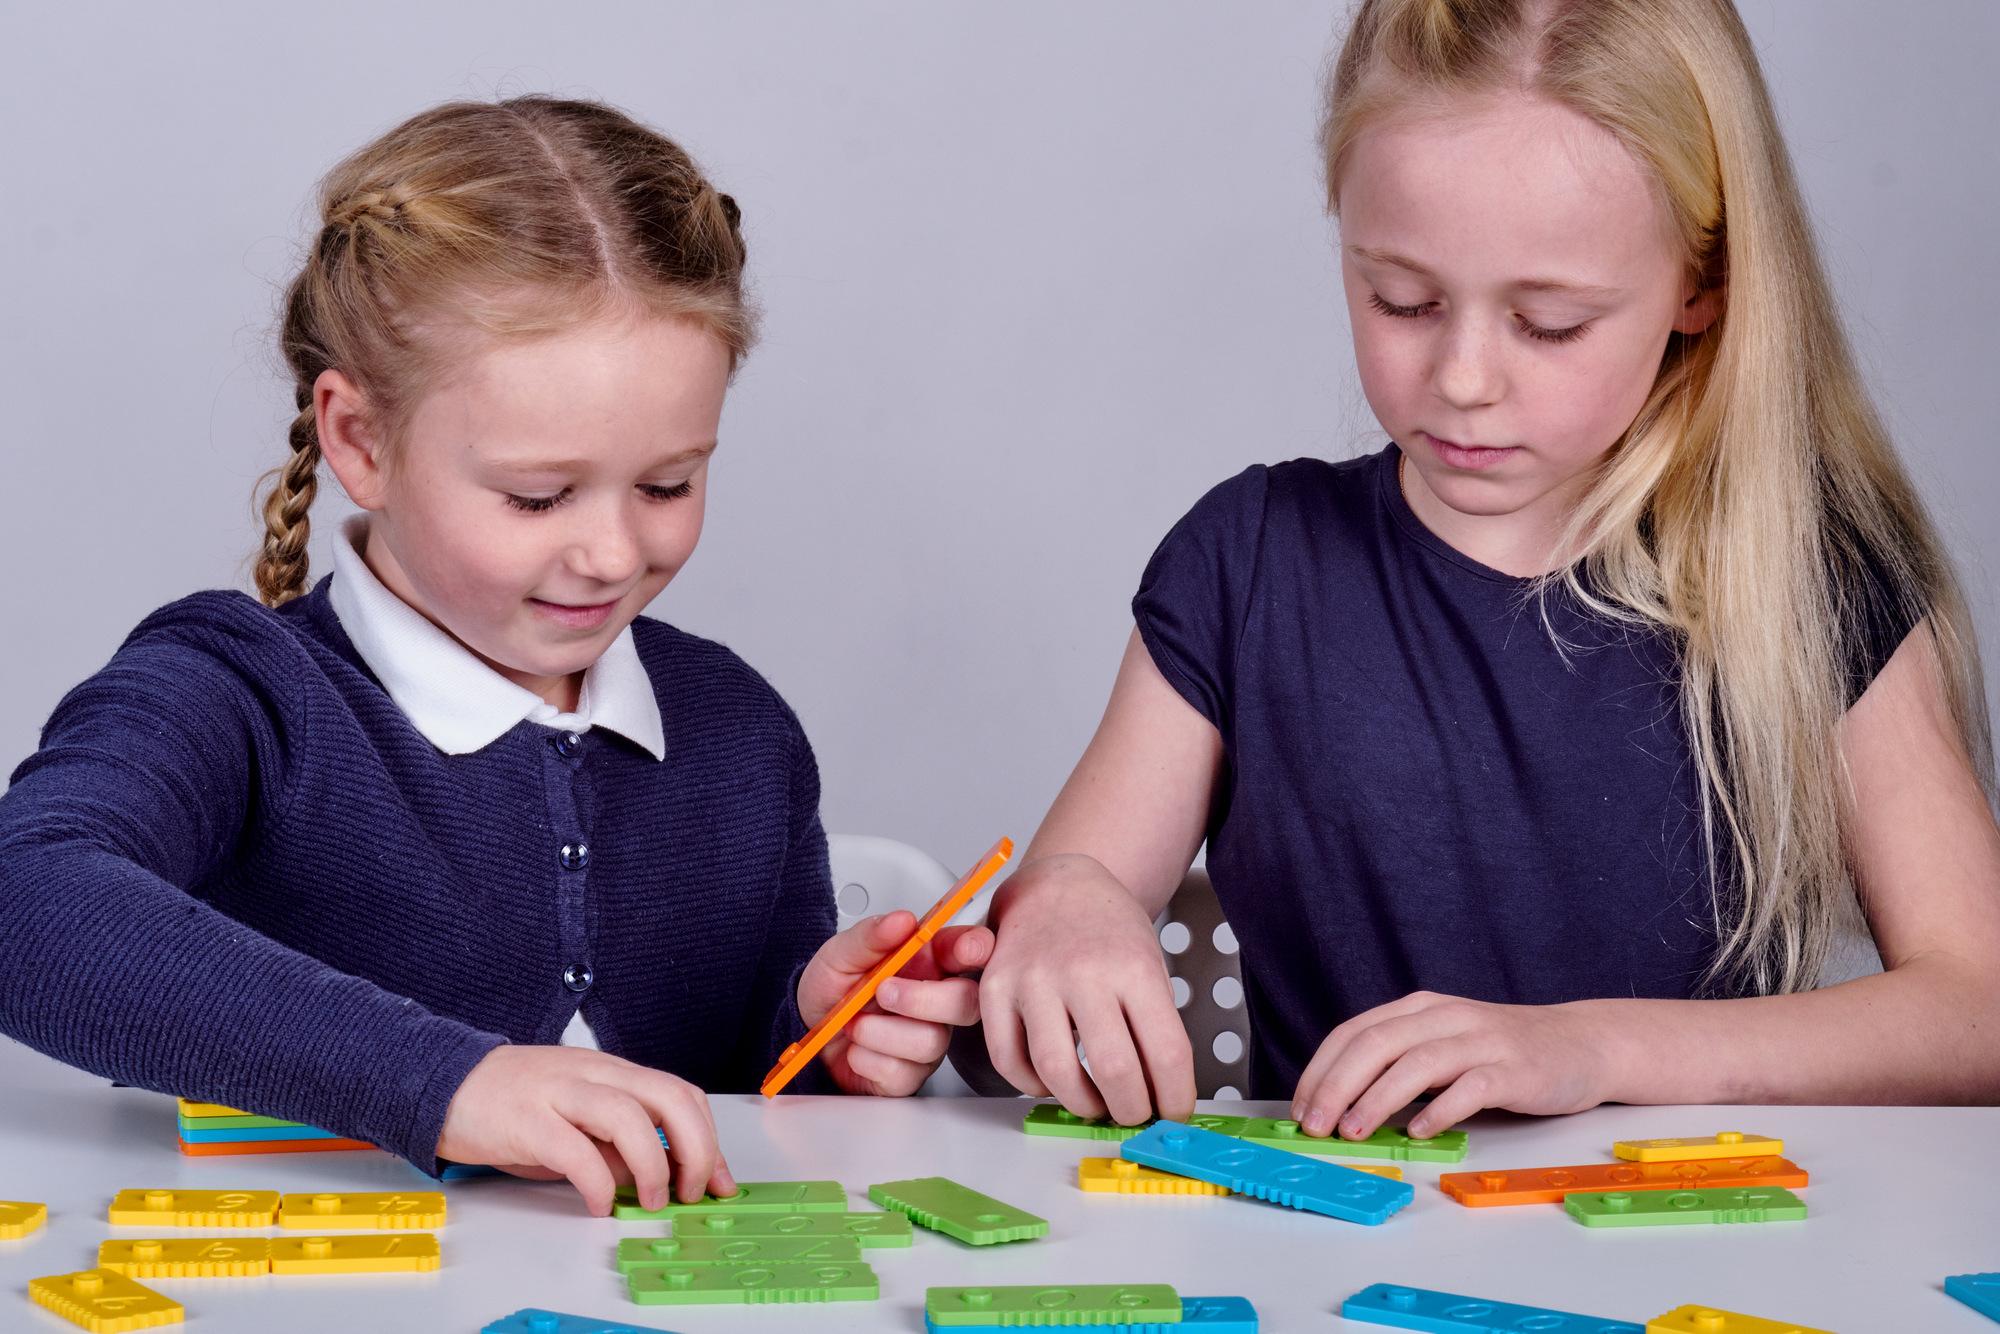 STEM for Girls with the newmero bricks